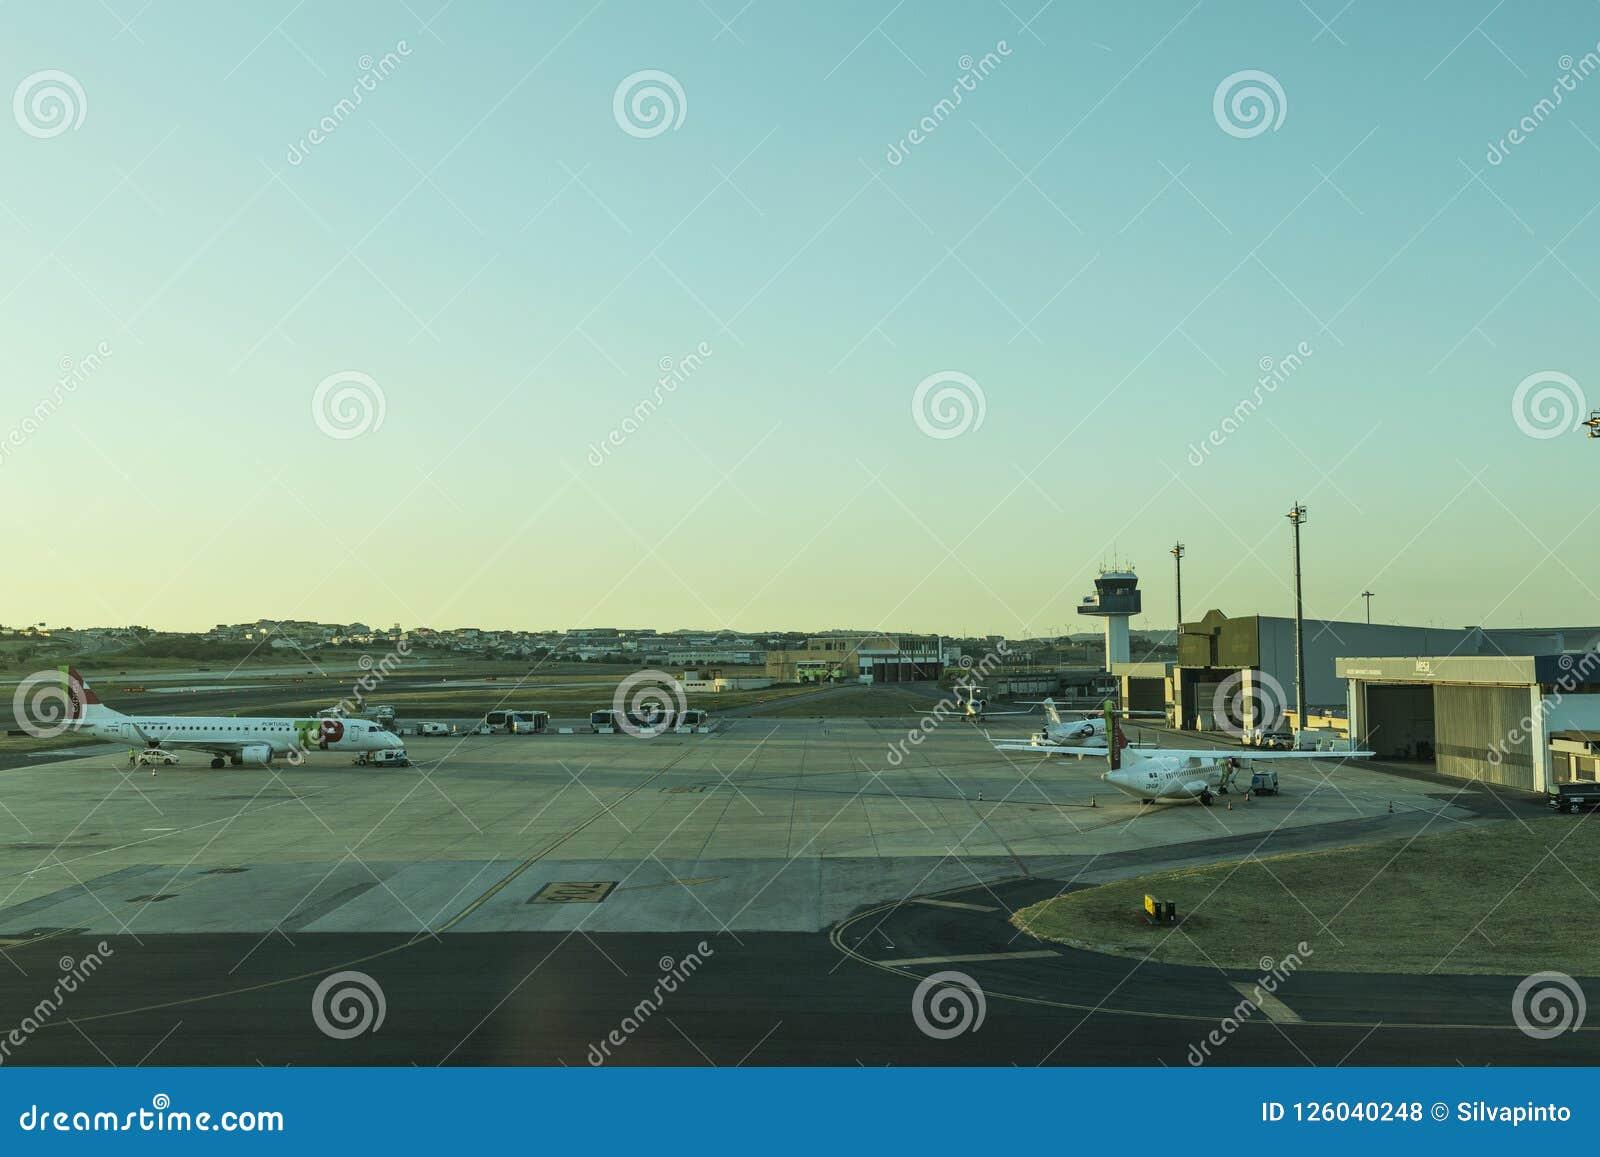 LISBON/PORTUGAL 11-ОЕ АВГУСТА 2018 - рисберма аэропорта Лиссабона со светом захода солнца